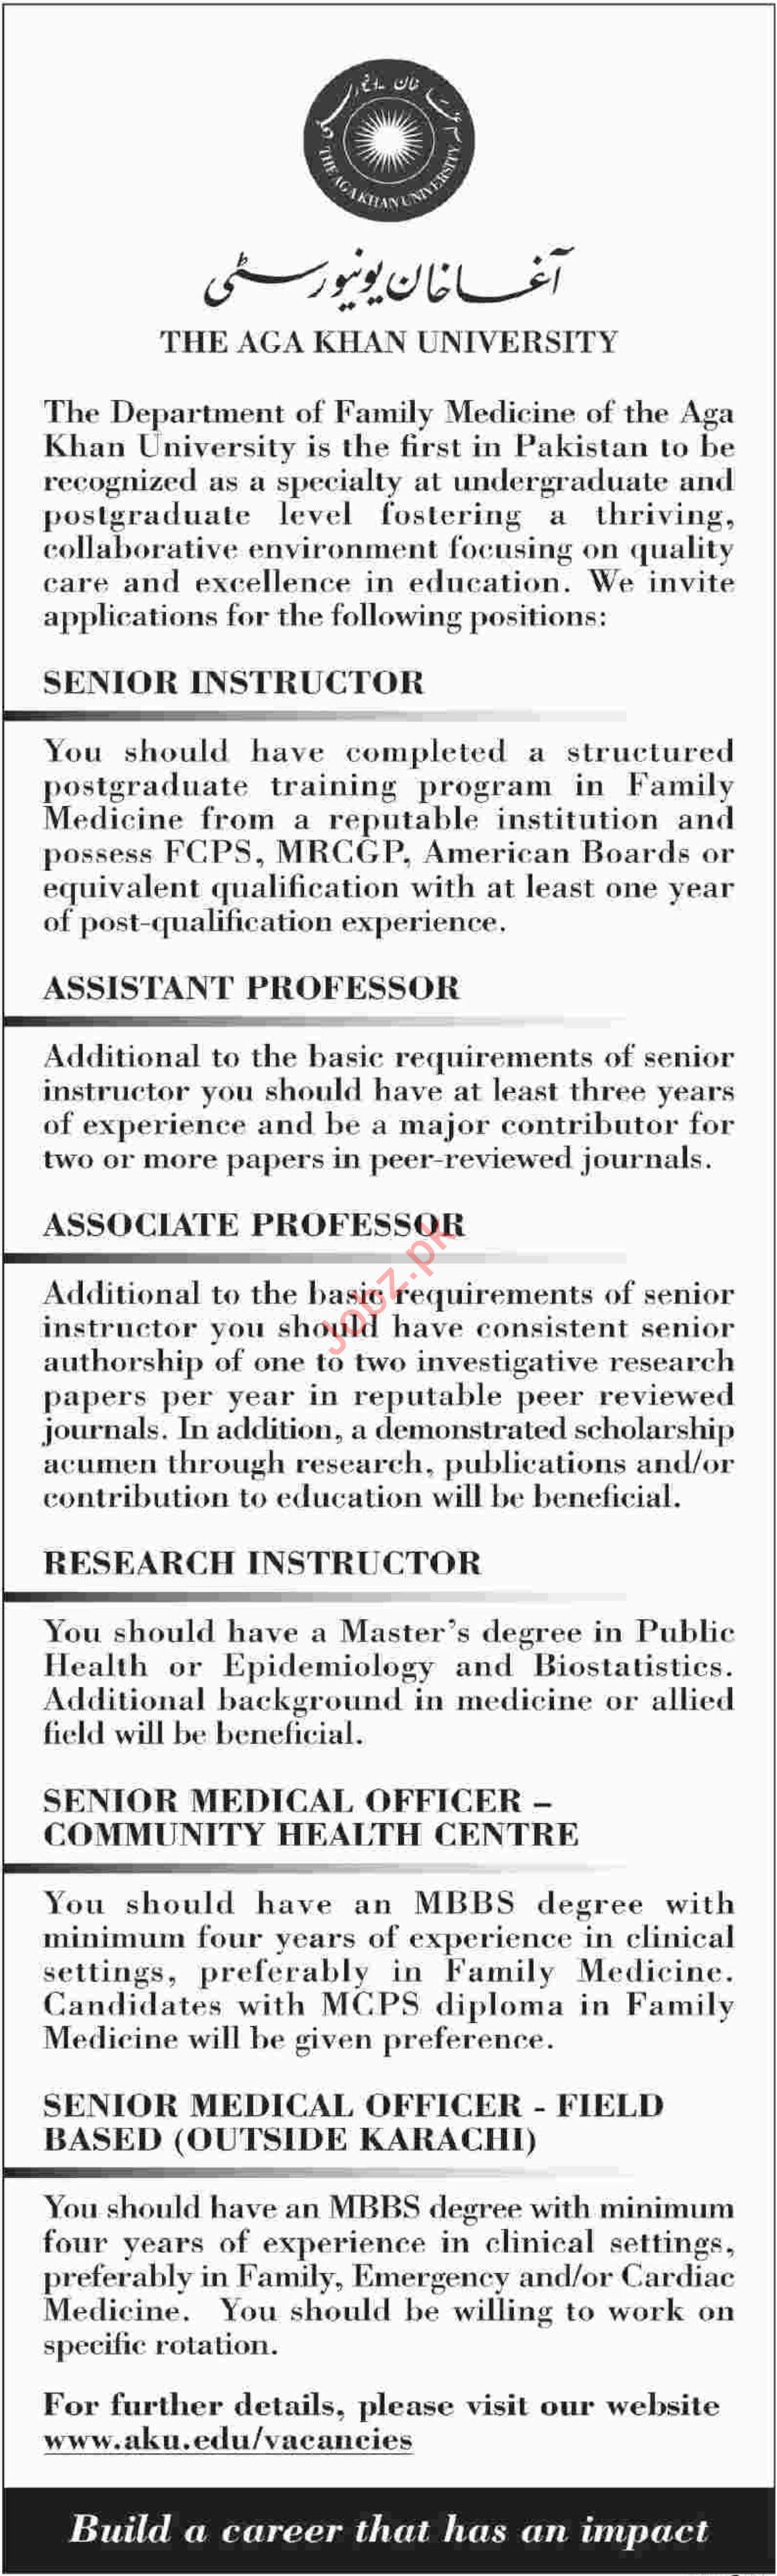 The Aga Khan University AKU Senior Instructor Jobs 2019 Job